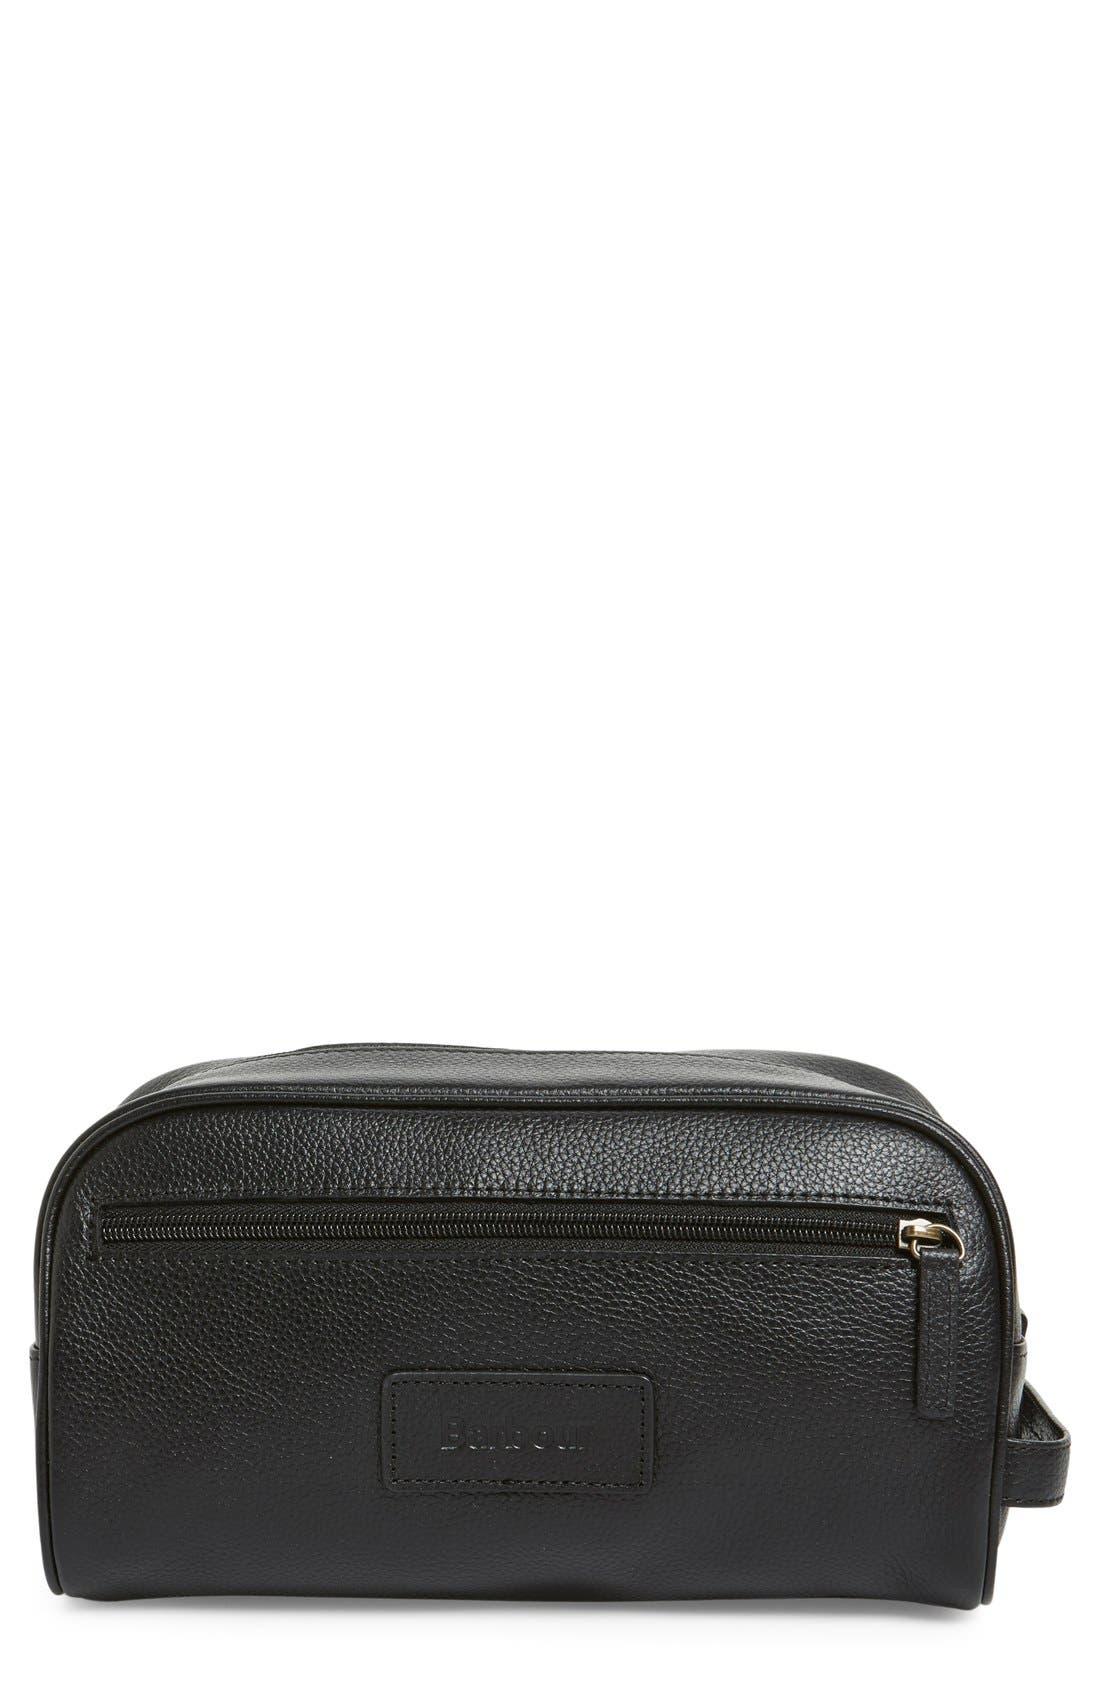 Leather Travel Kit,                         Main,                         color, Black